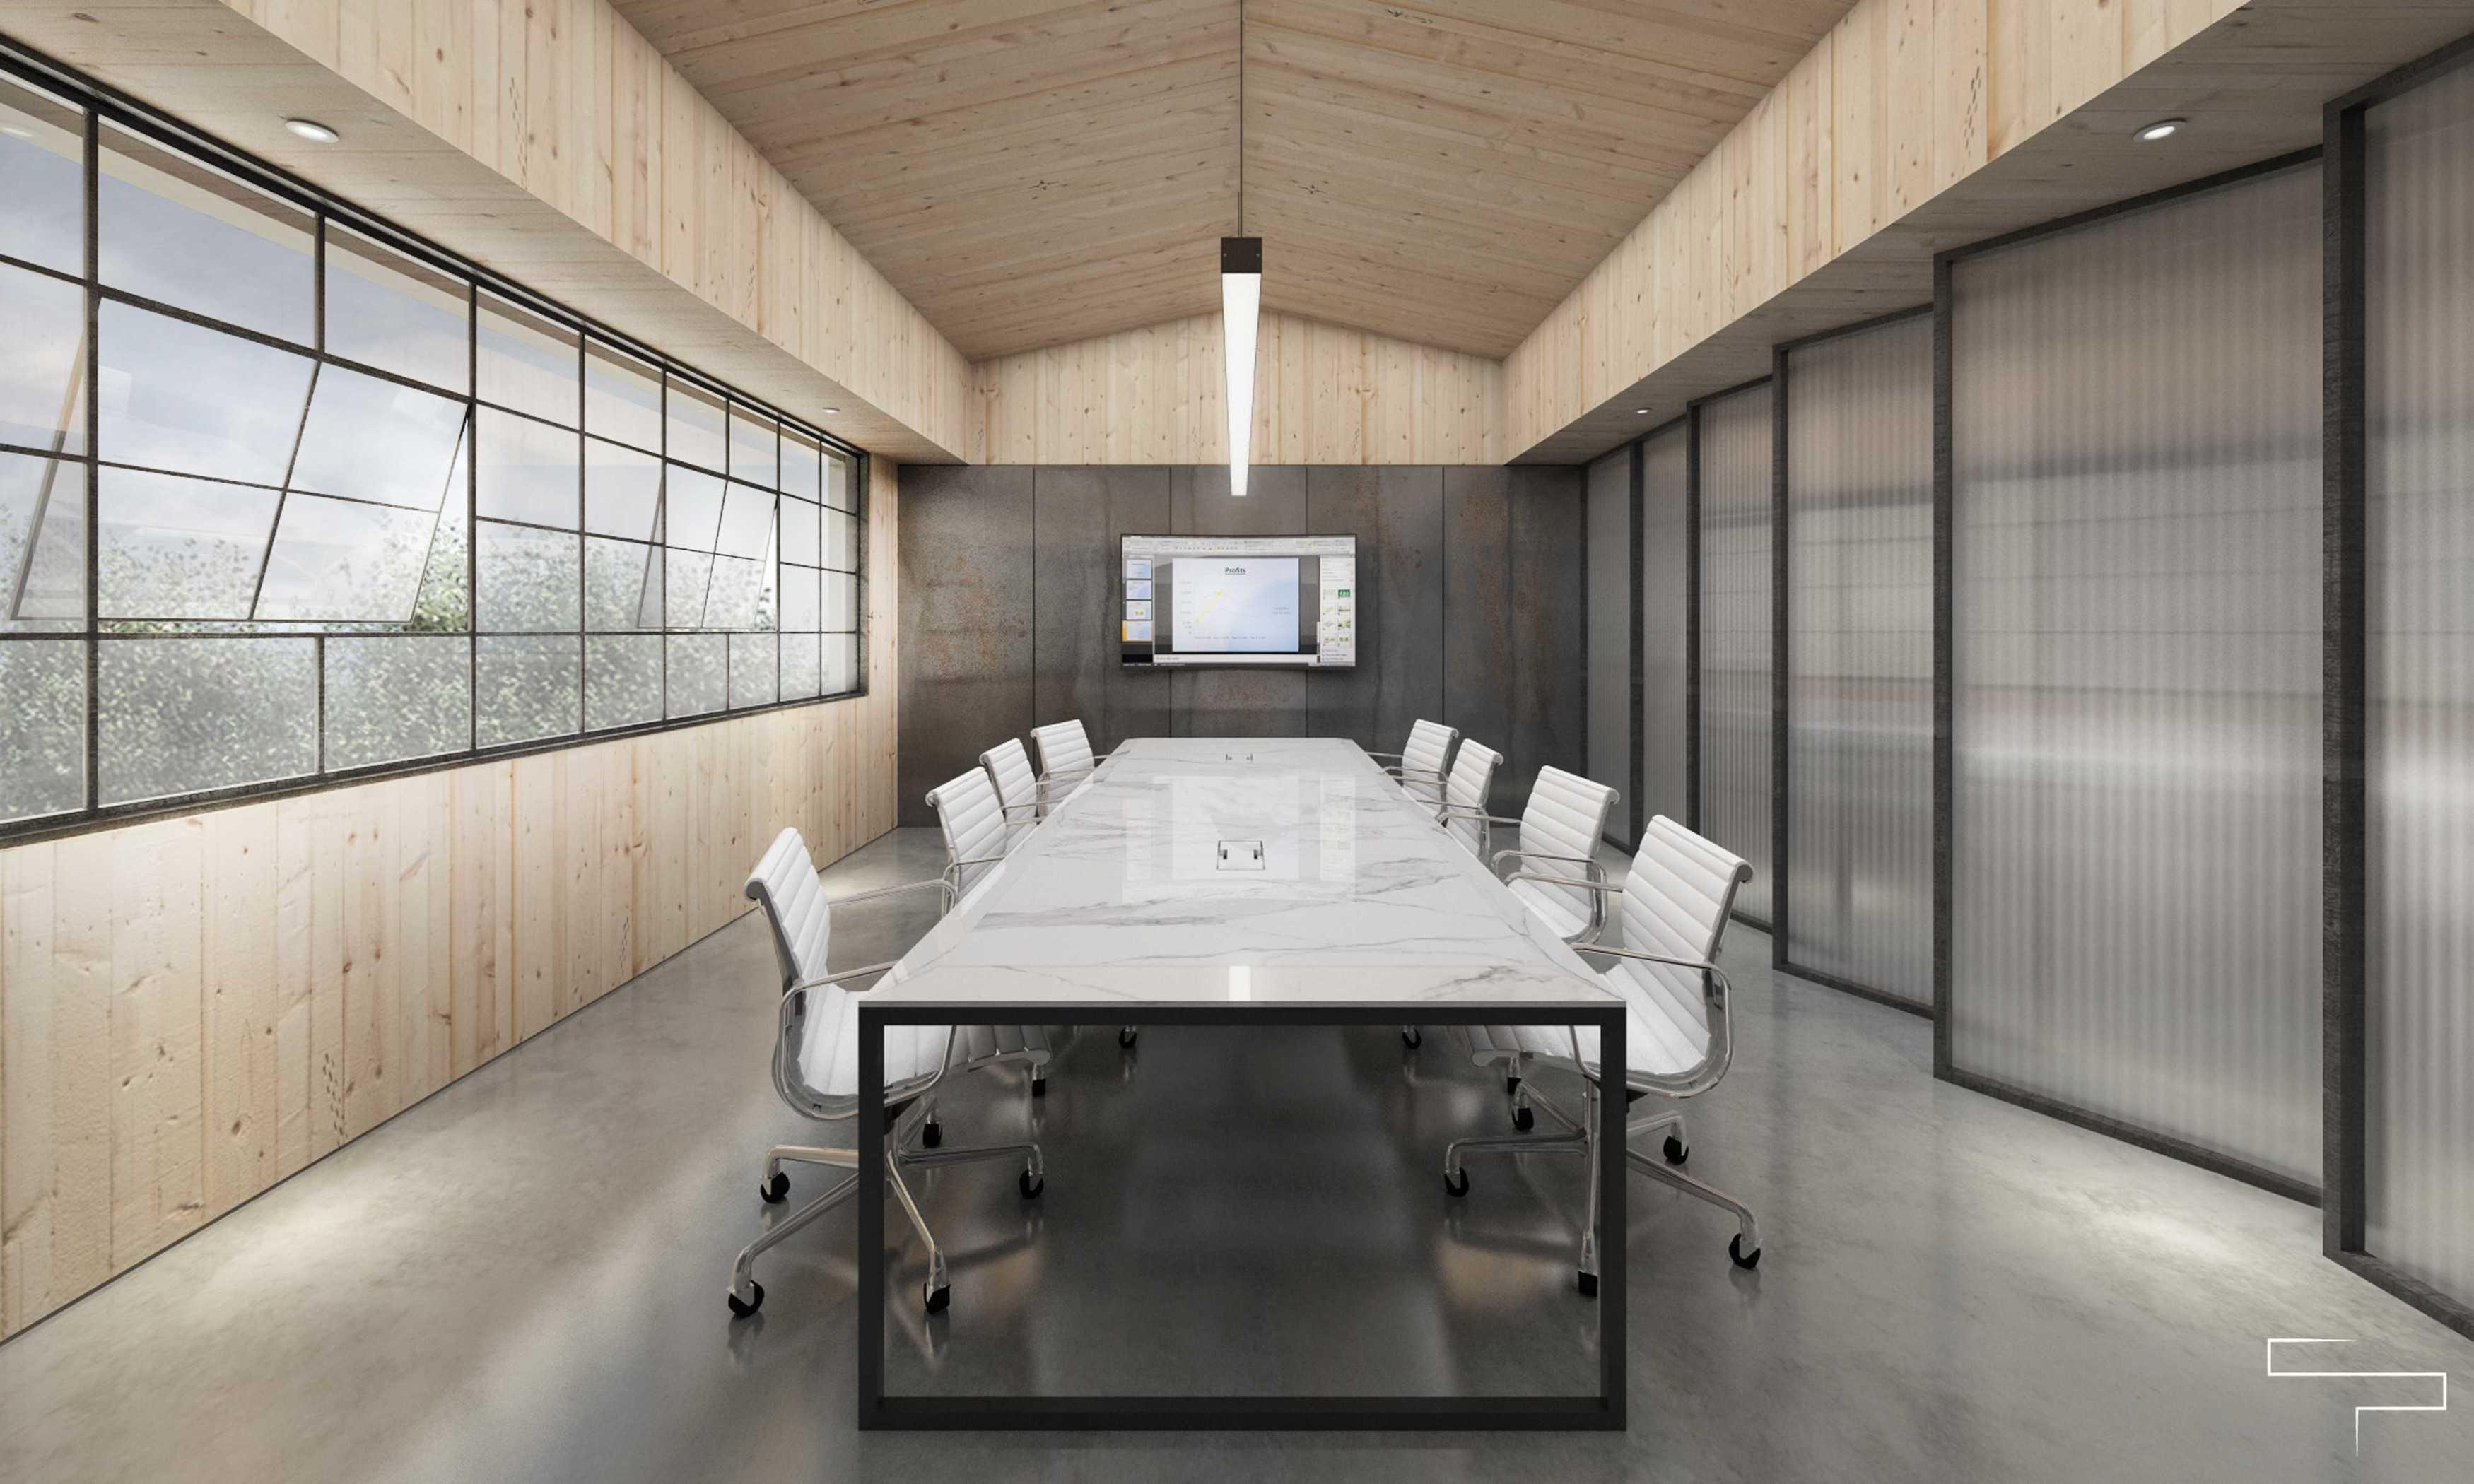 Sontani Partners Abc Office Kamal, North Jakarta Kamal, North Jakarta Meeting Room Industrial,kontemporer,wood,modern  23372